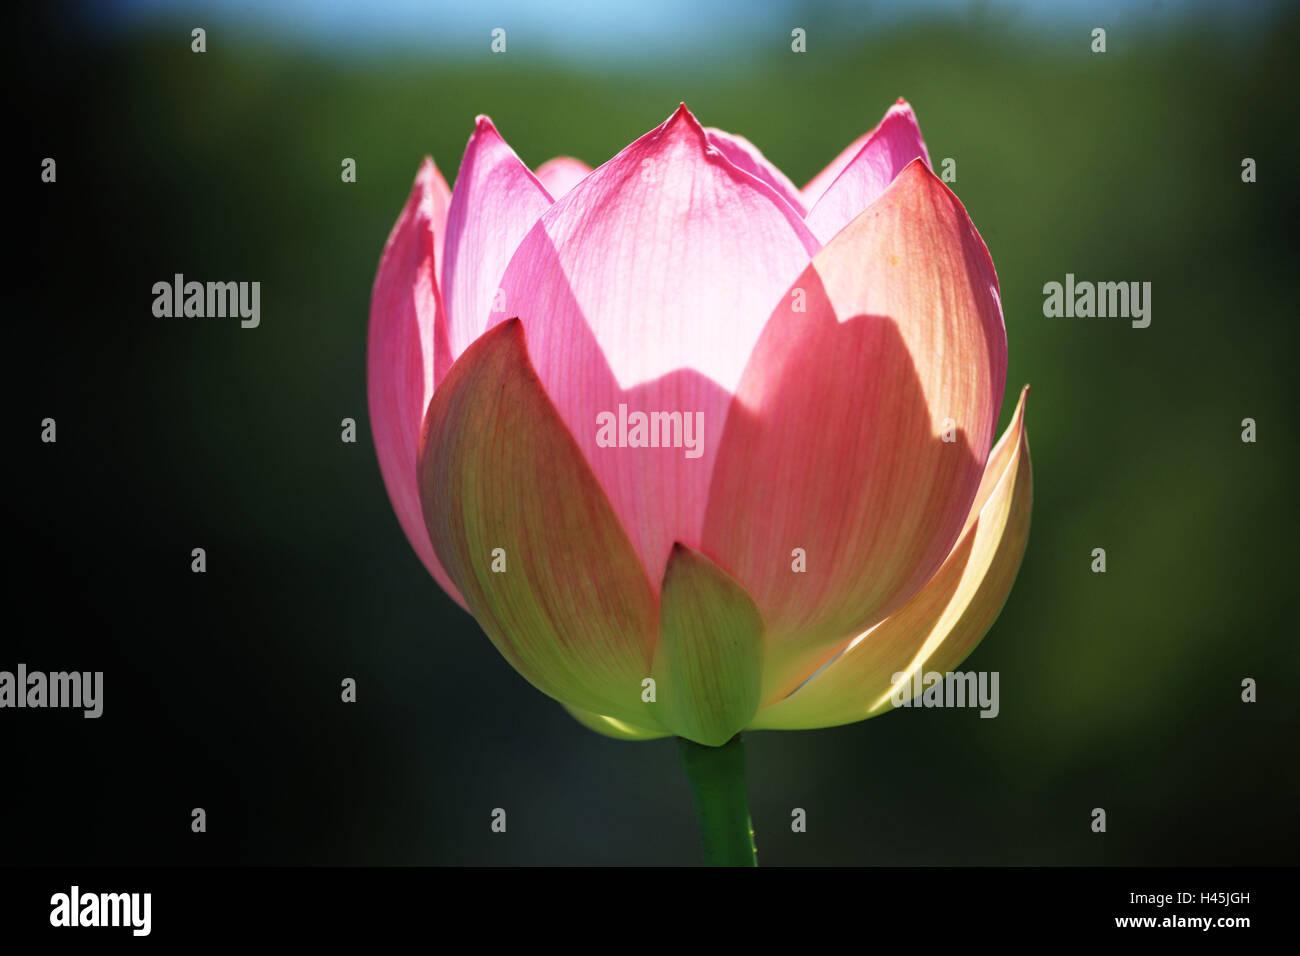 Closed Lotus Flower Stock Photos Closed Lotus Flower Stock Images